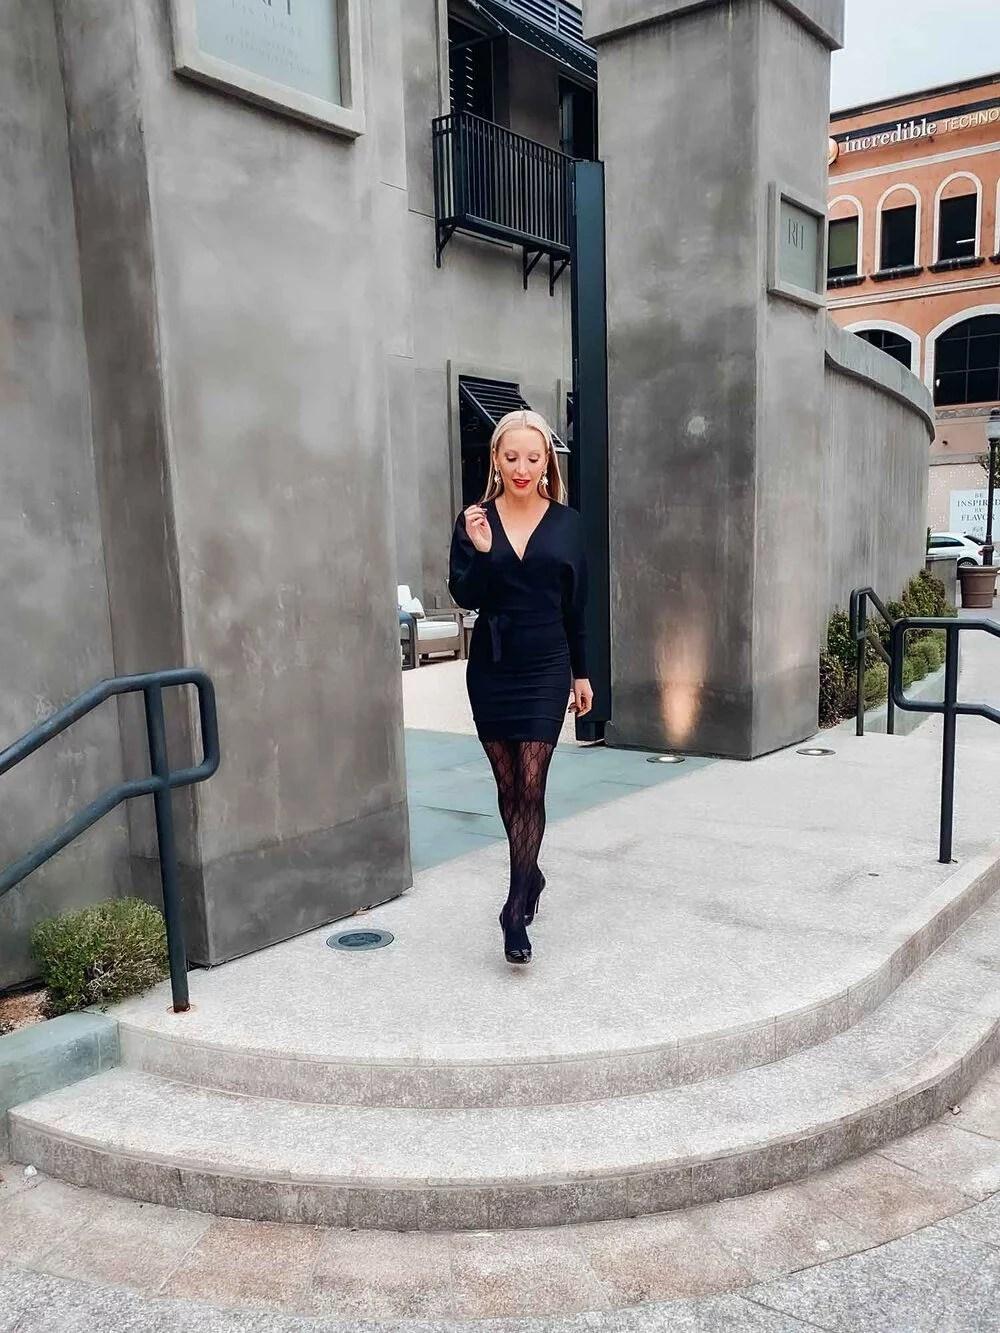 Winter fashion model walking Femme Luxe Finery black dress black gucci tights